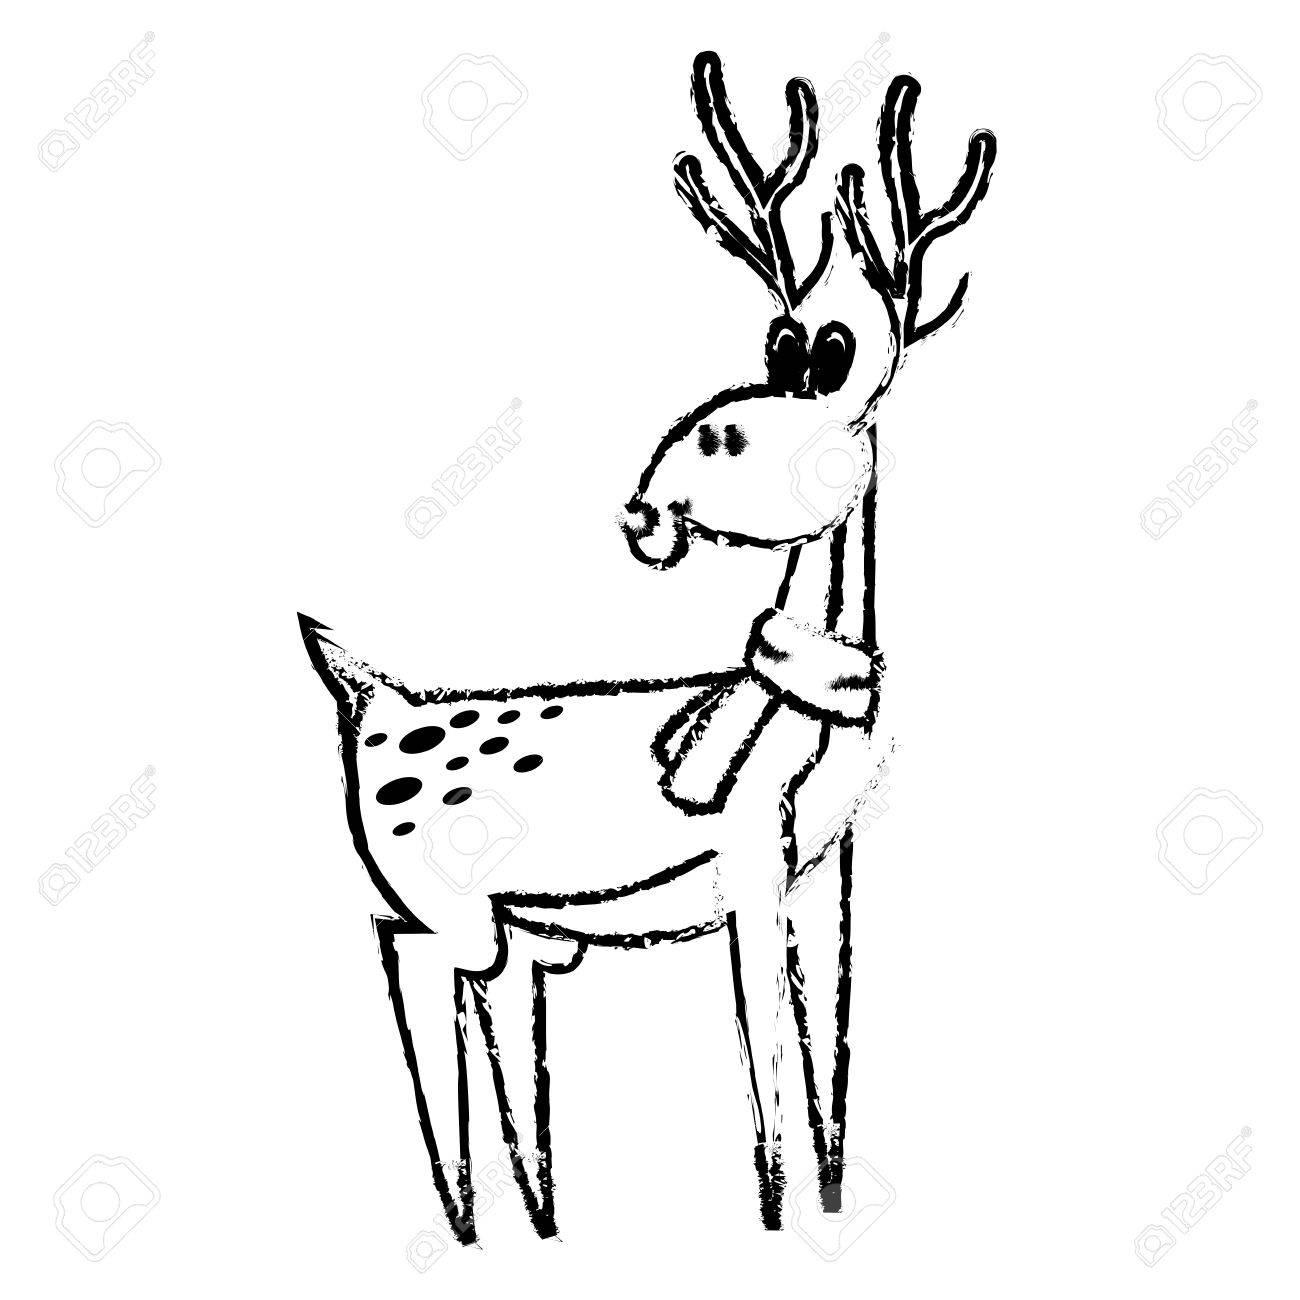 Mignon Cerf Dessin Anime Noel Corne Image Vecteur Illustration Clip